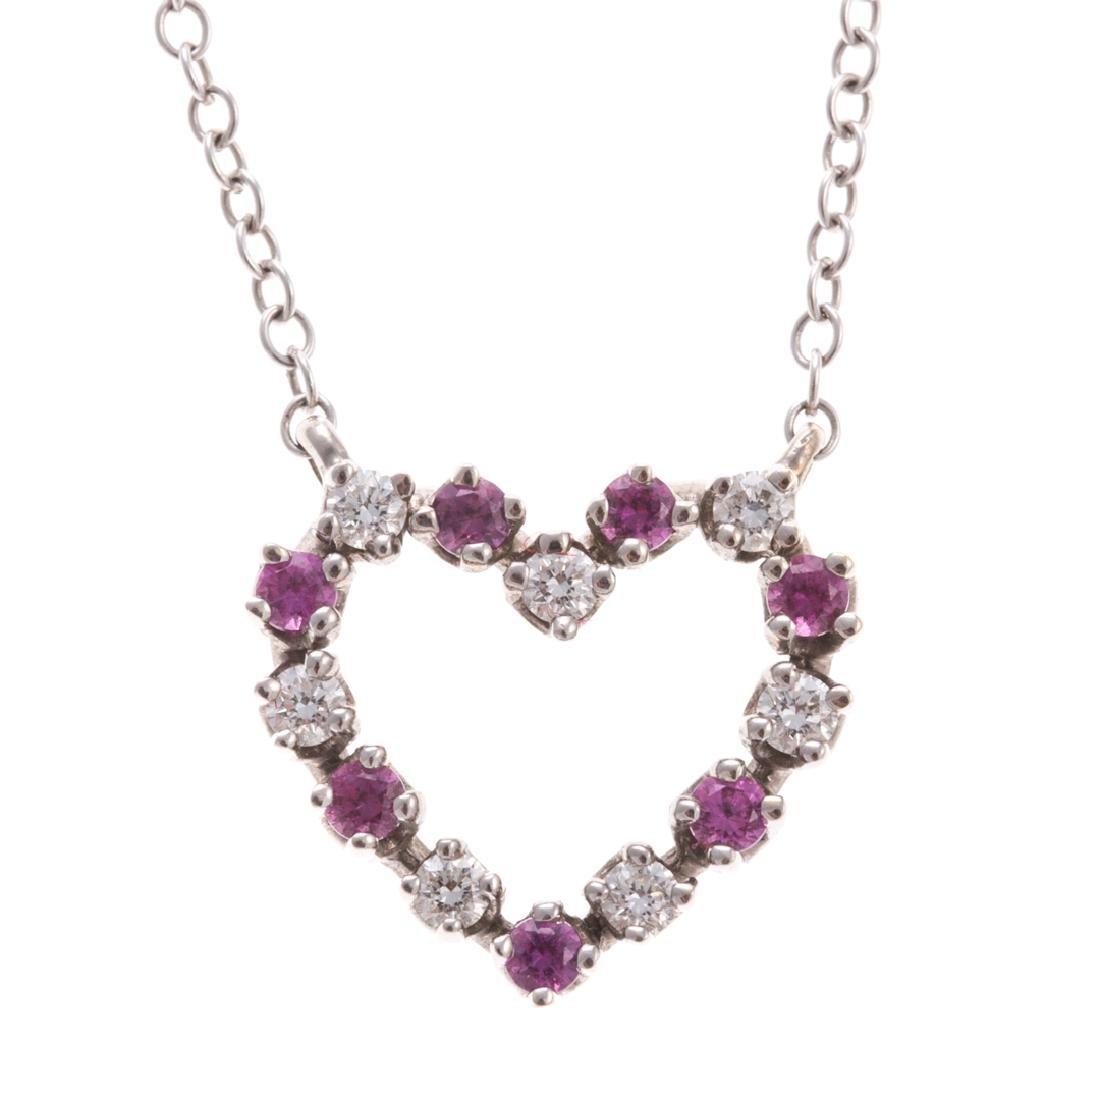 A Lady's Ruby & Diamond Heart Necklace in 18K